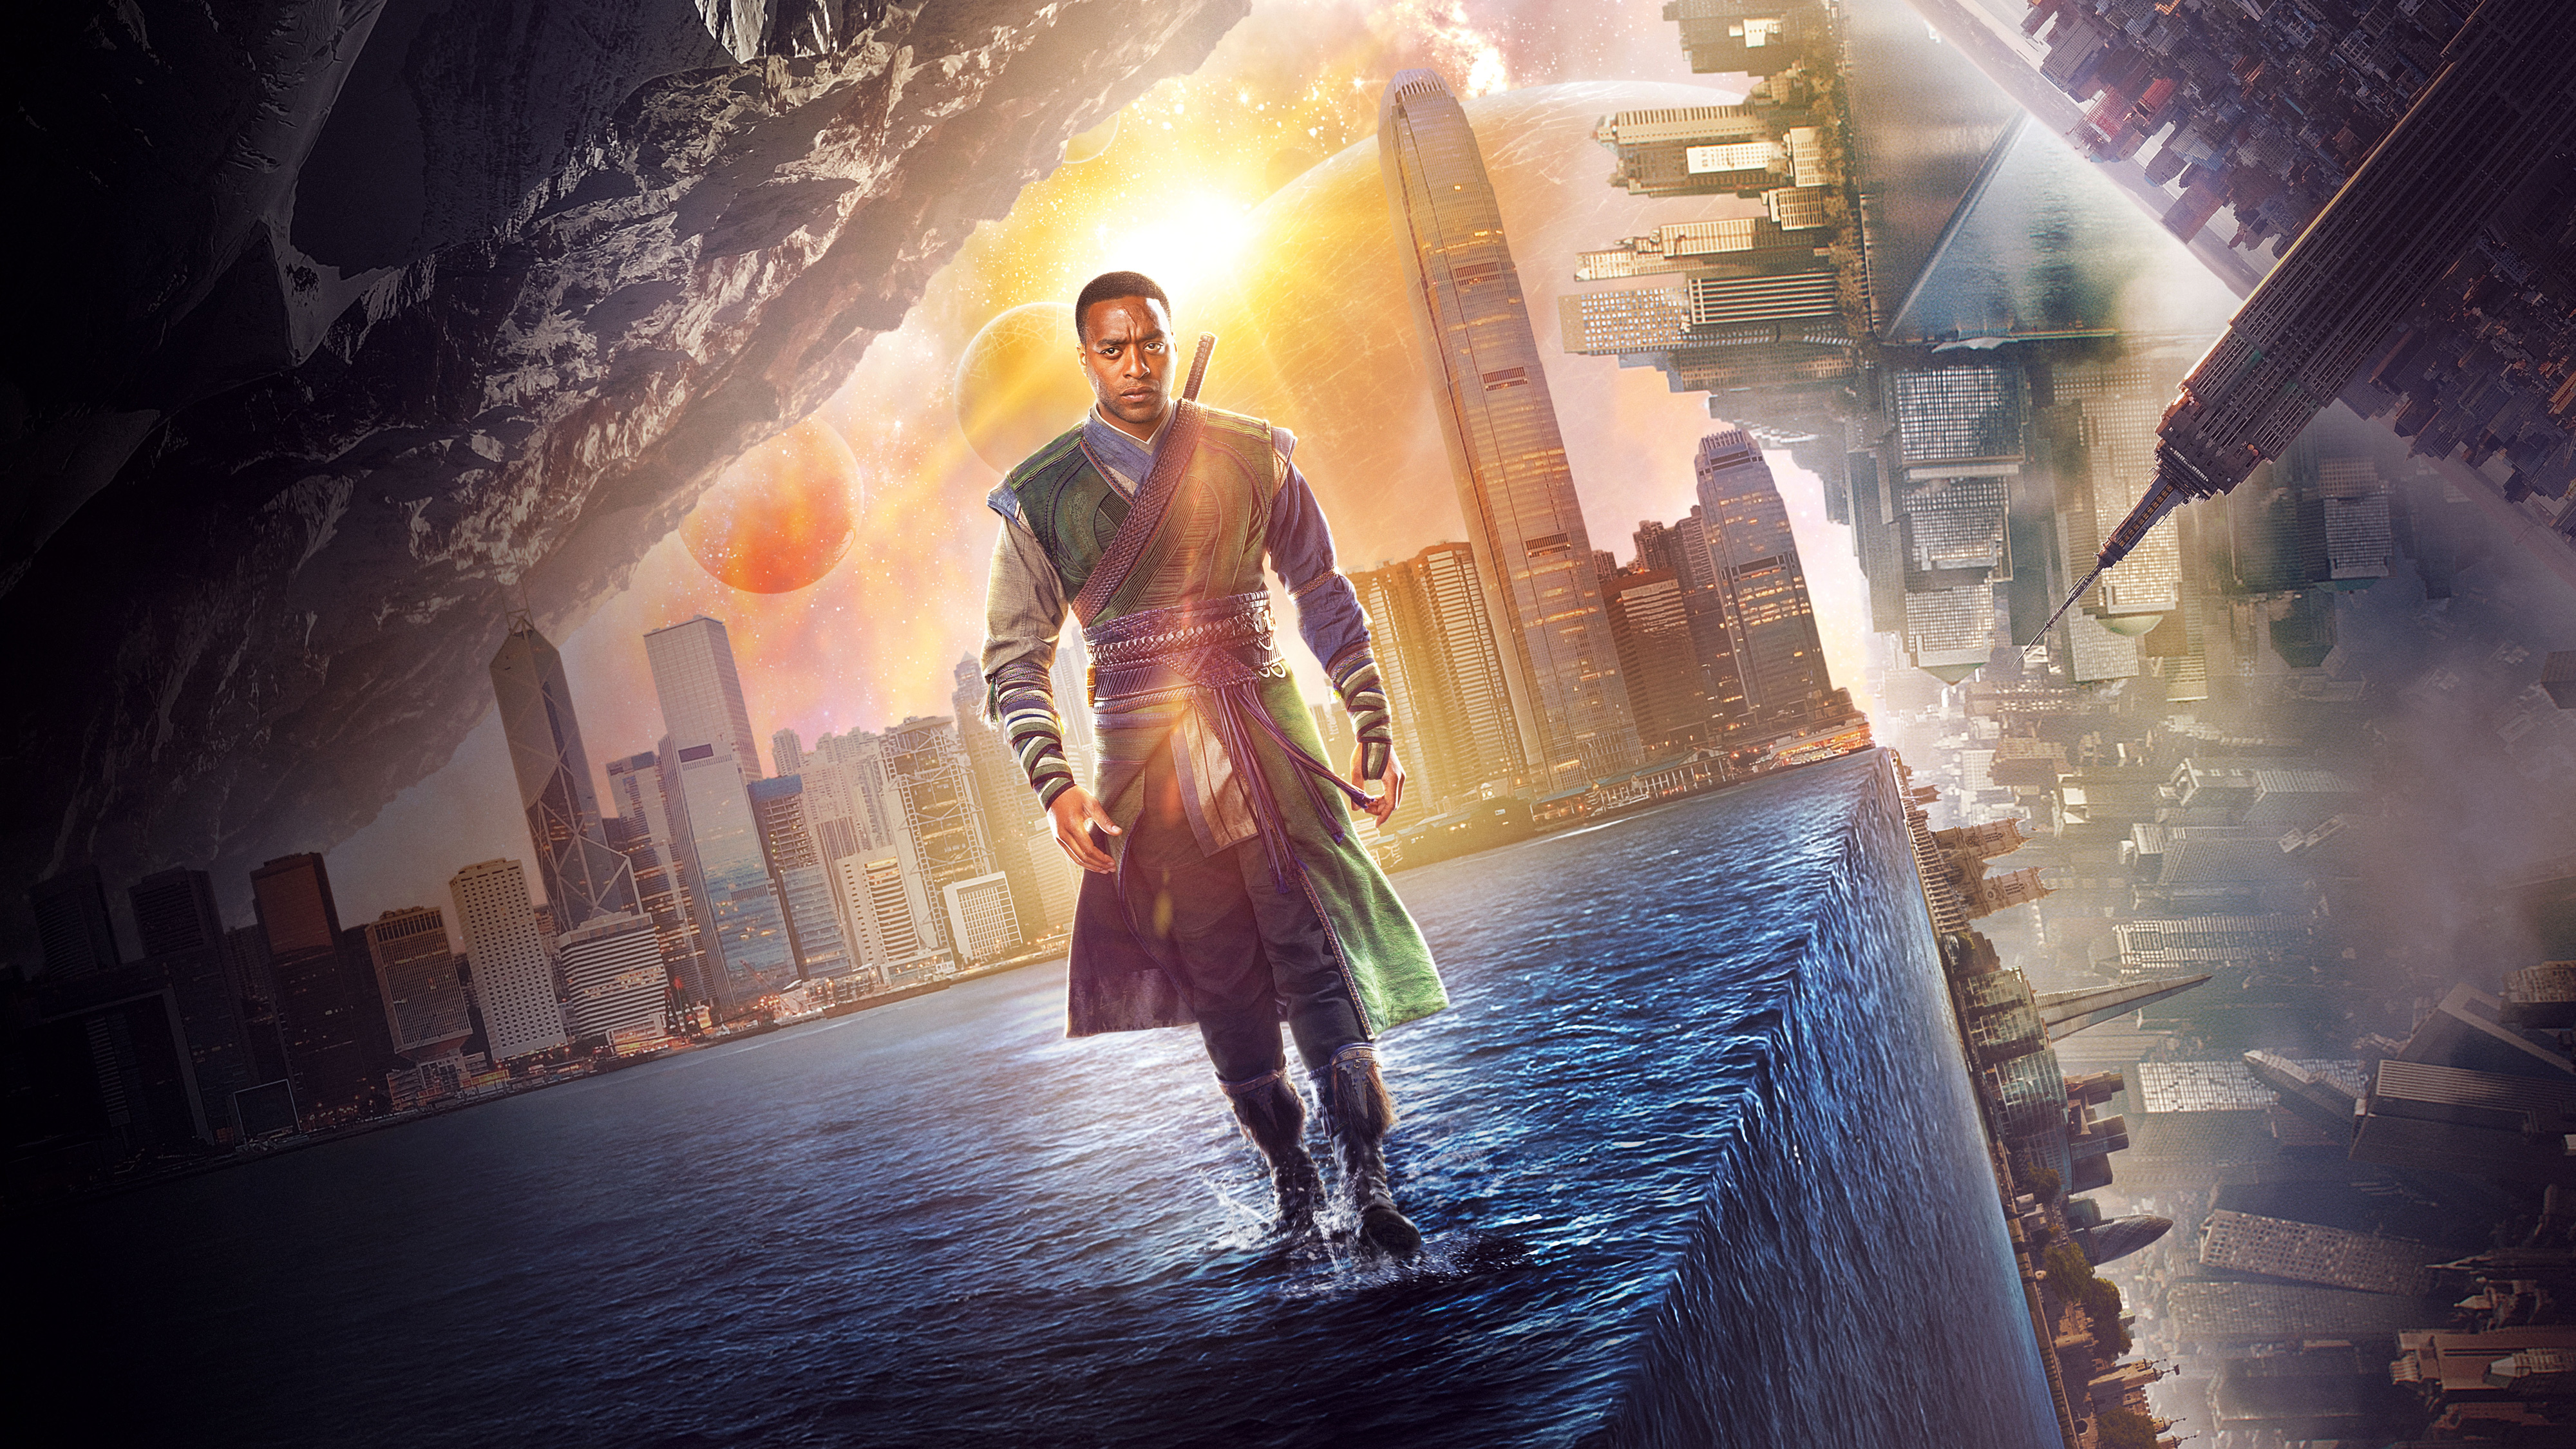 Doctor Strange Marvel Movie Wallpapers Widescreen Cinema: Doctor Strange 4k Ultra HD Wallpaper